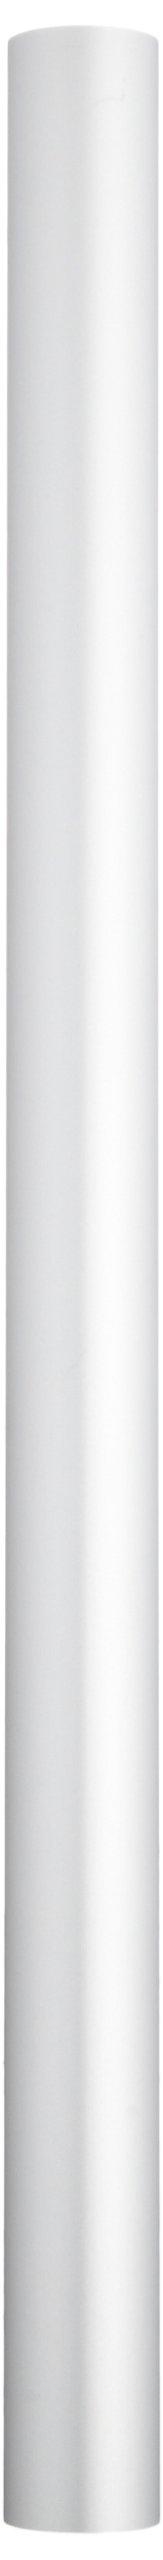 WERMA 975.840.40 Tube, Aluminum Eloxiert, Silver